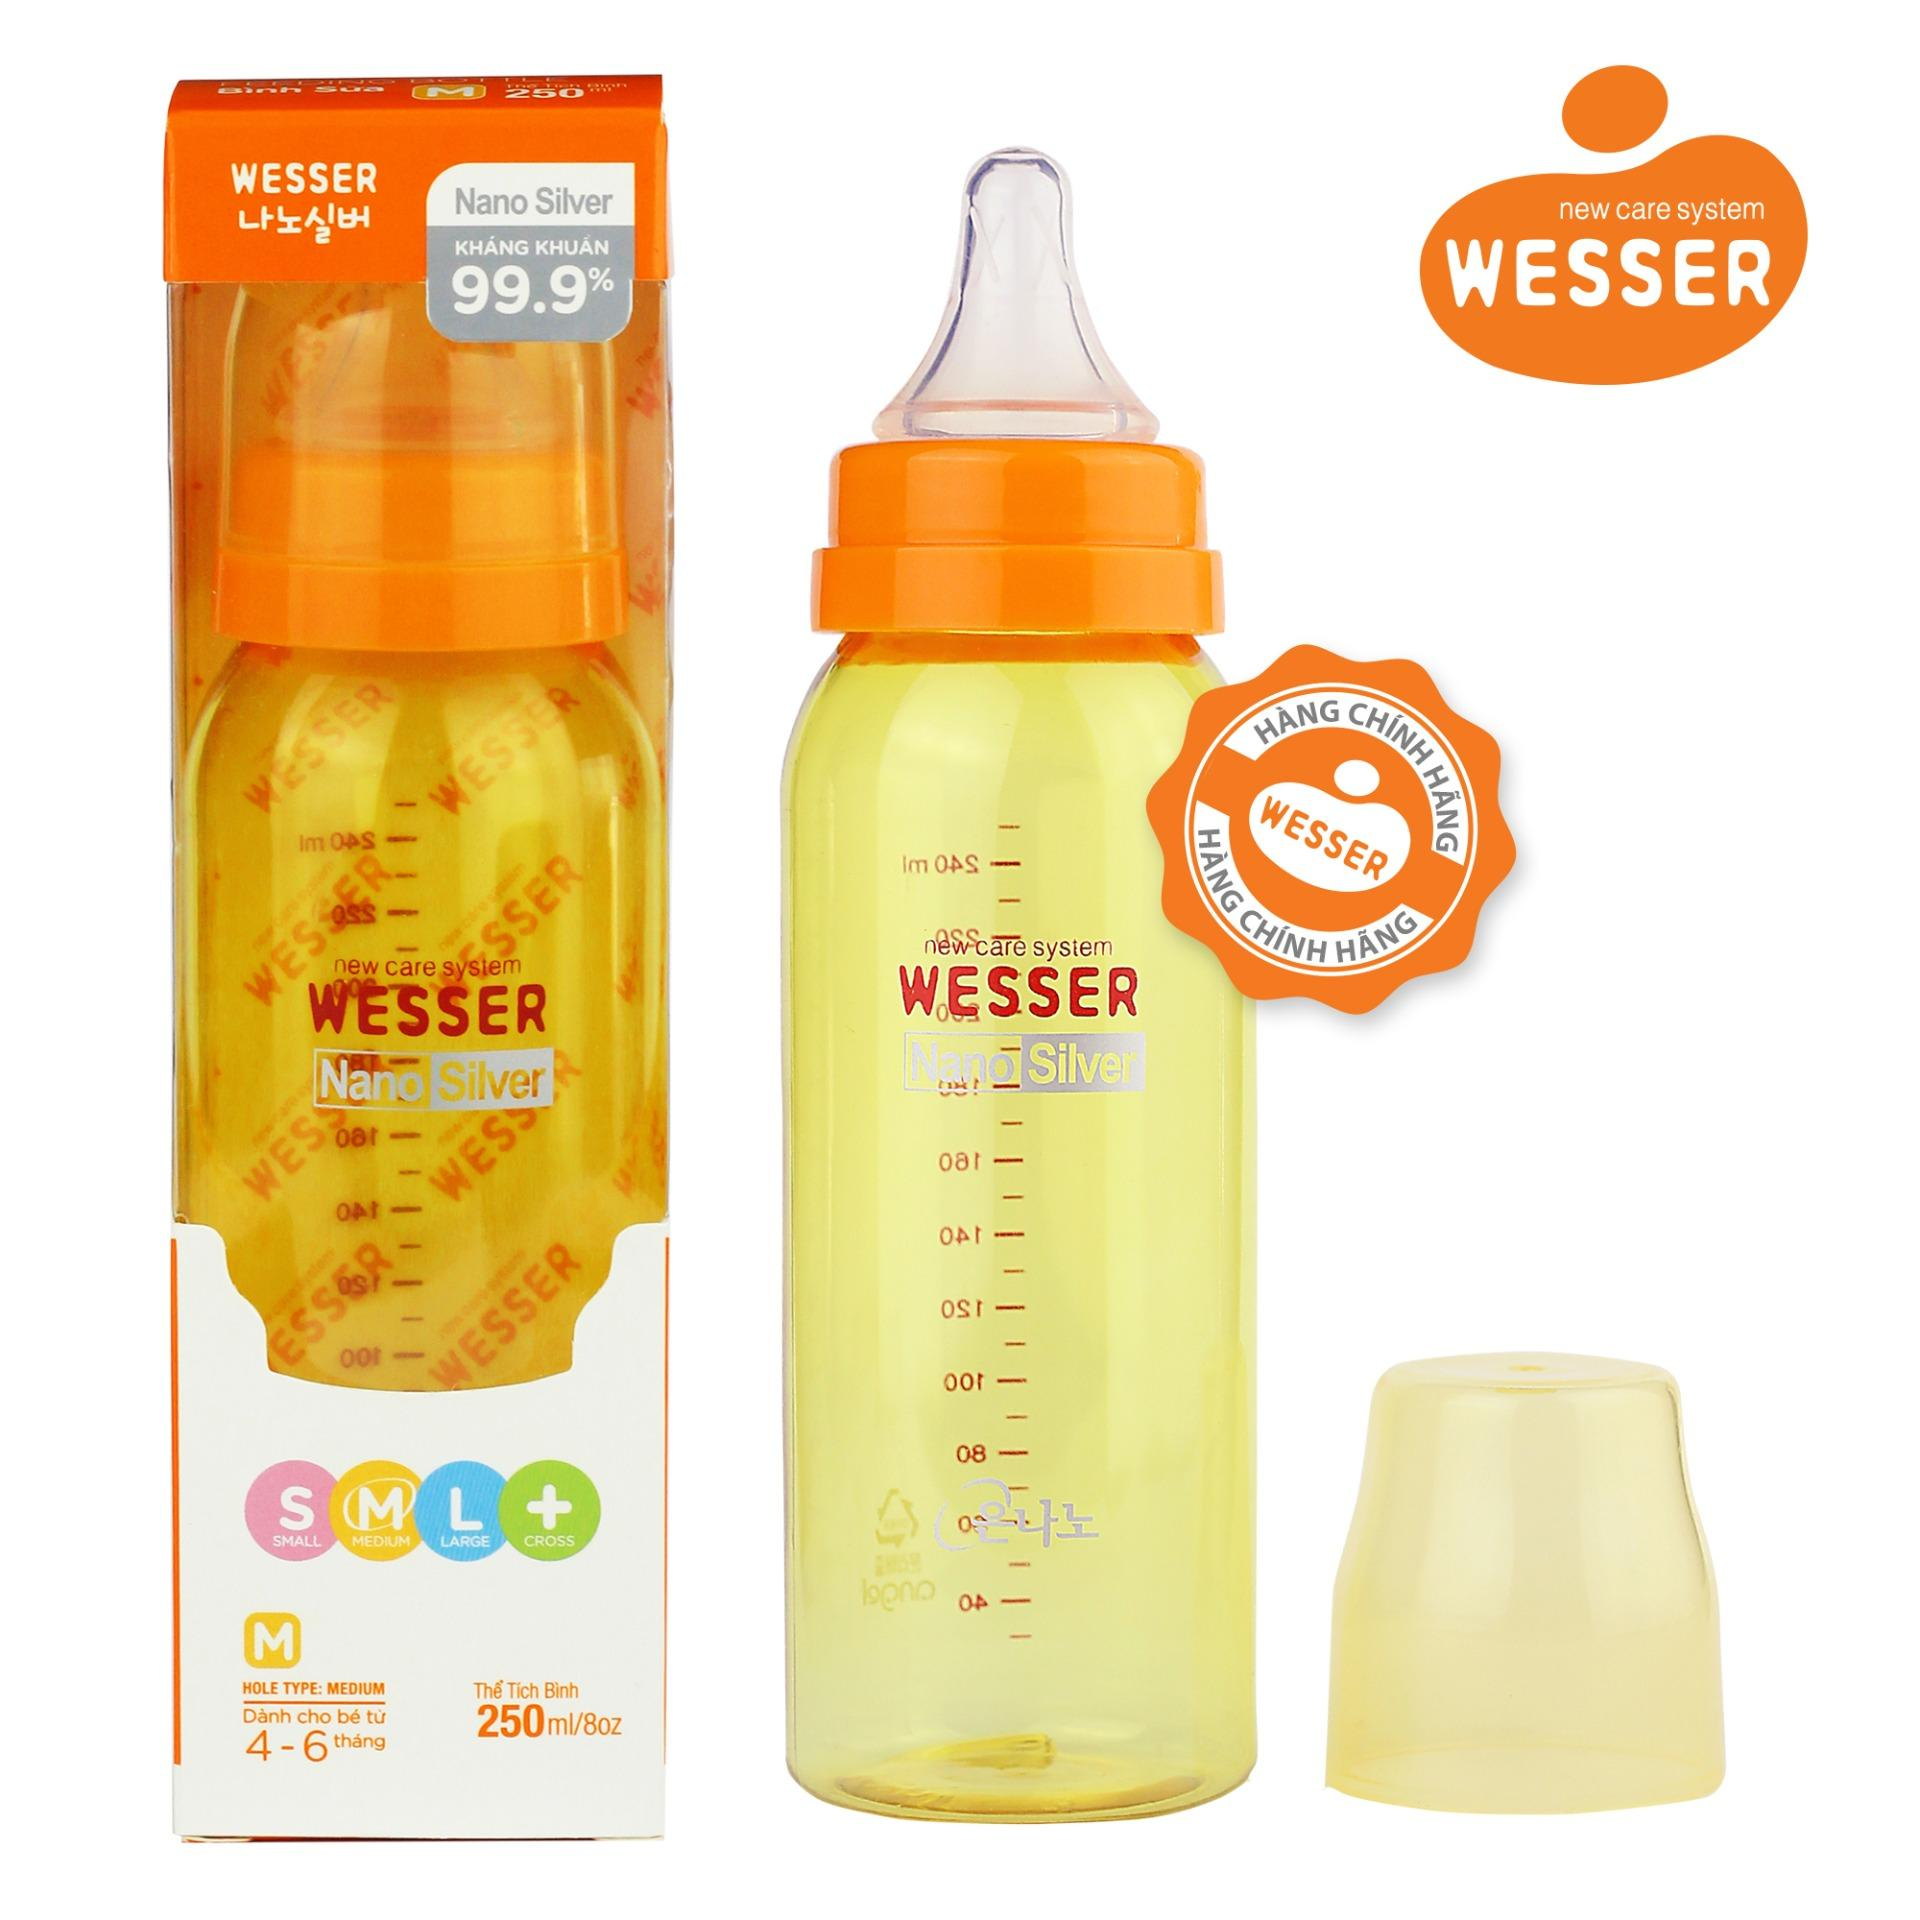 Bộ 2 Bình sữa Wesser Nano Silver cổ hẹp 250ml...